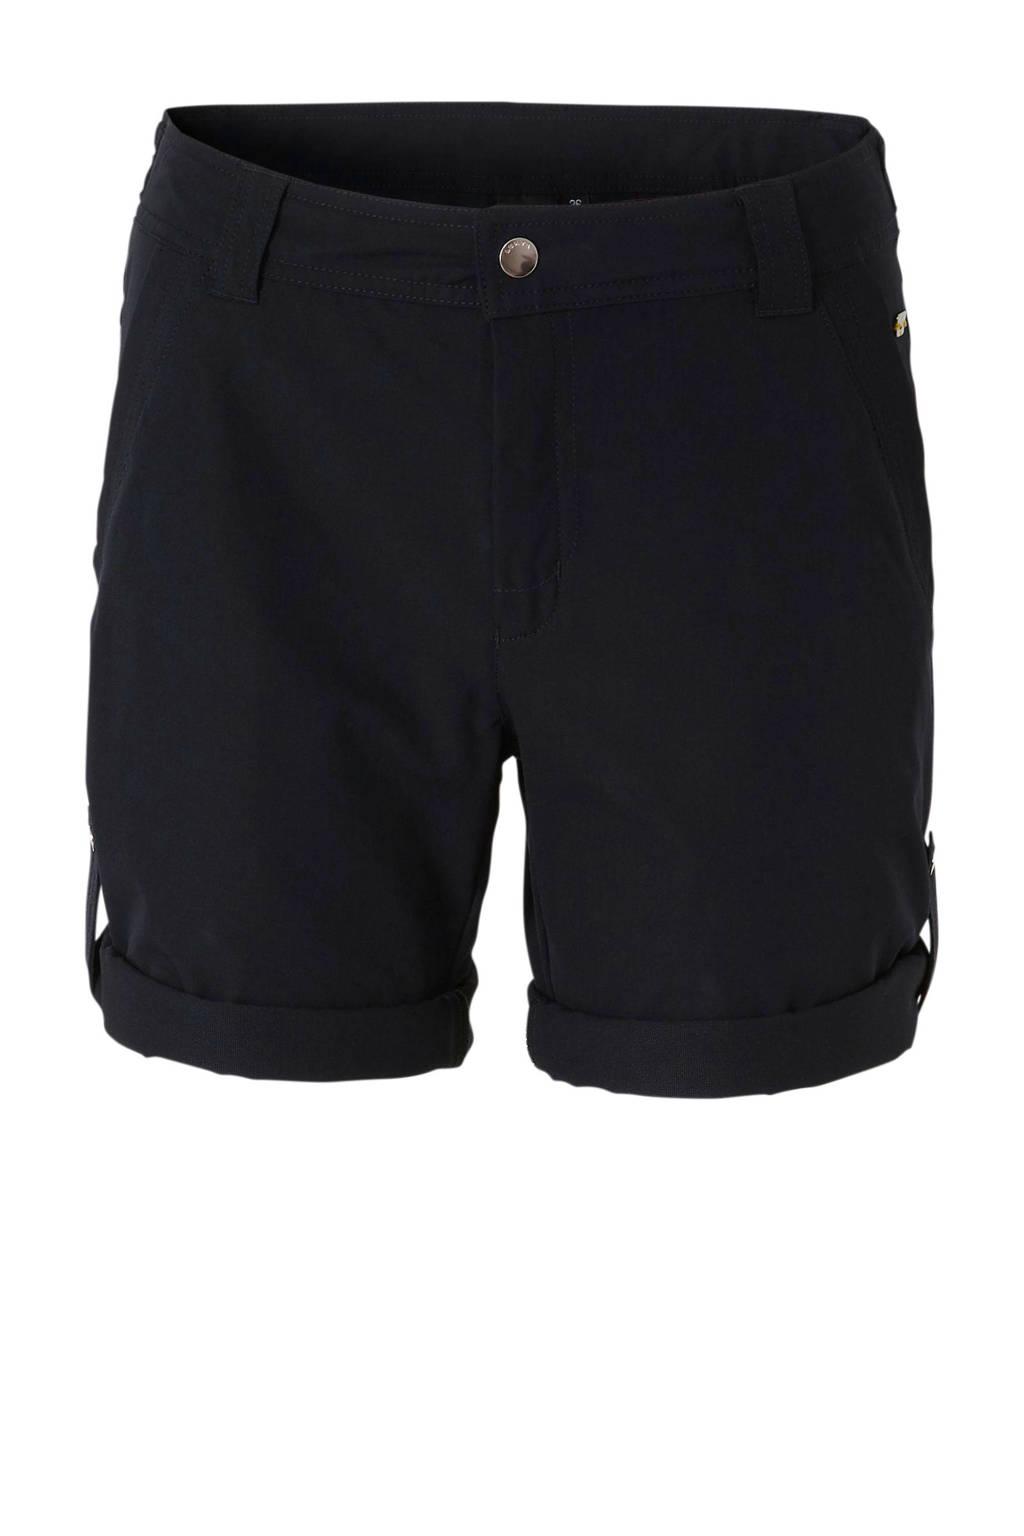 Luhta outdoor short Aseme donkerblauw, Donkerblauw